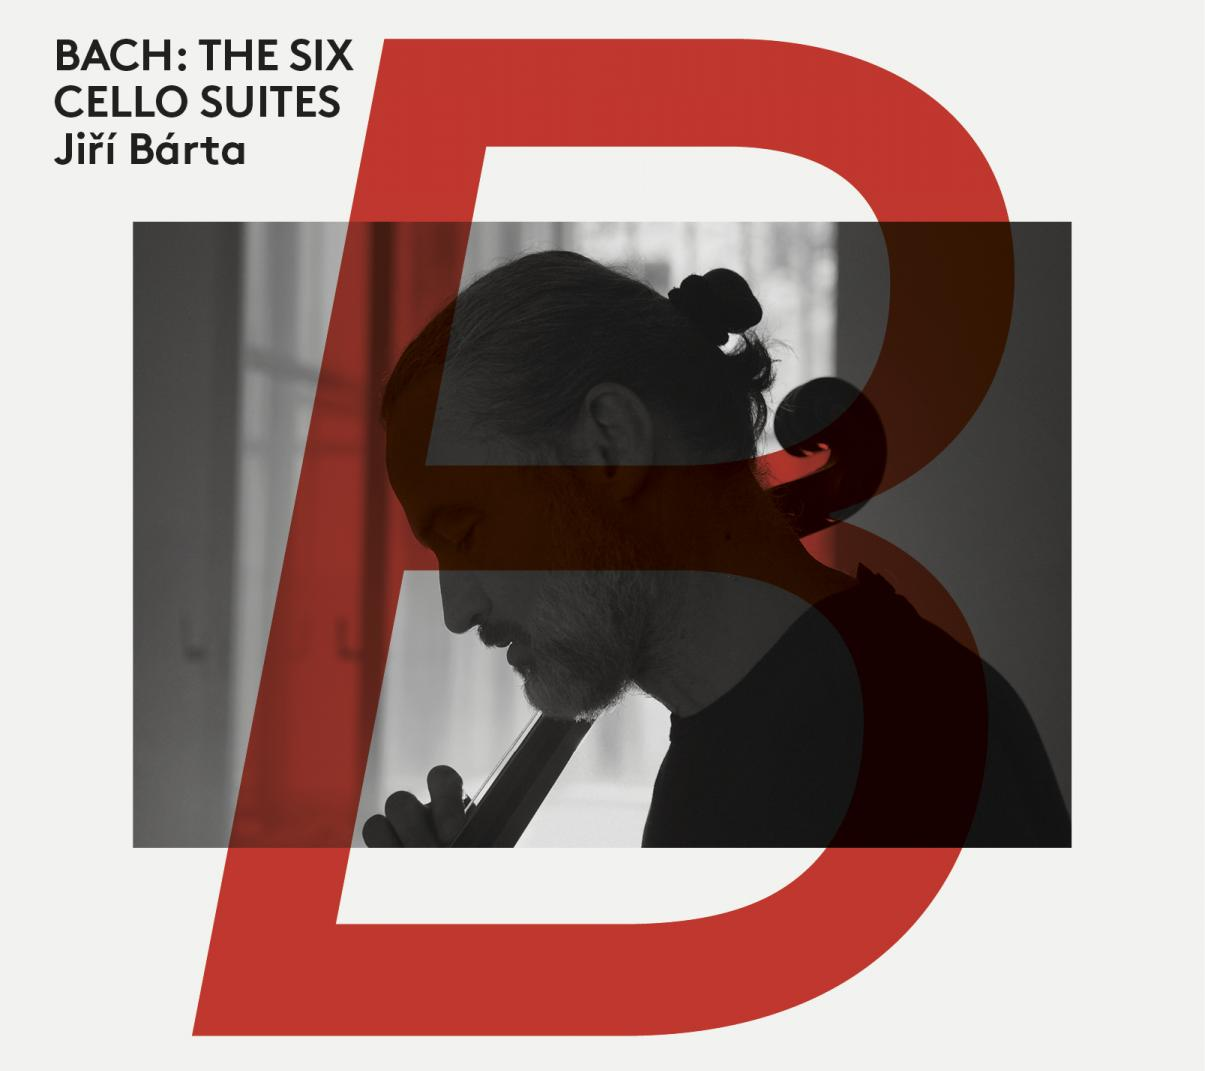 Jiří Bárta: Bach / The Six Cello Suites